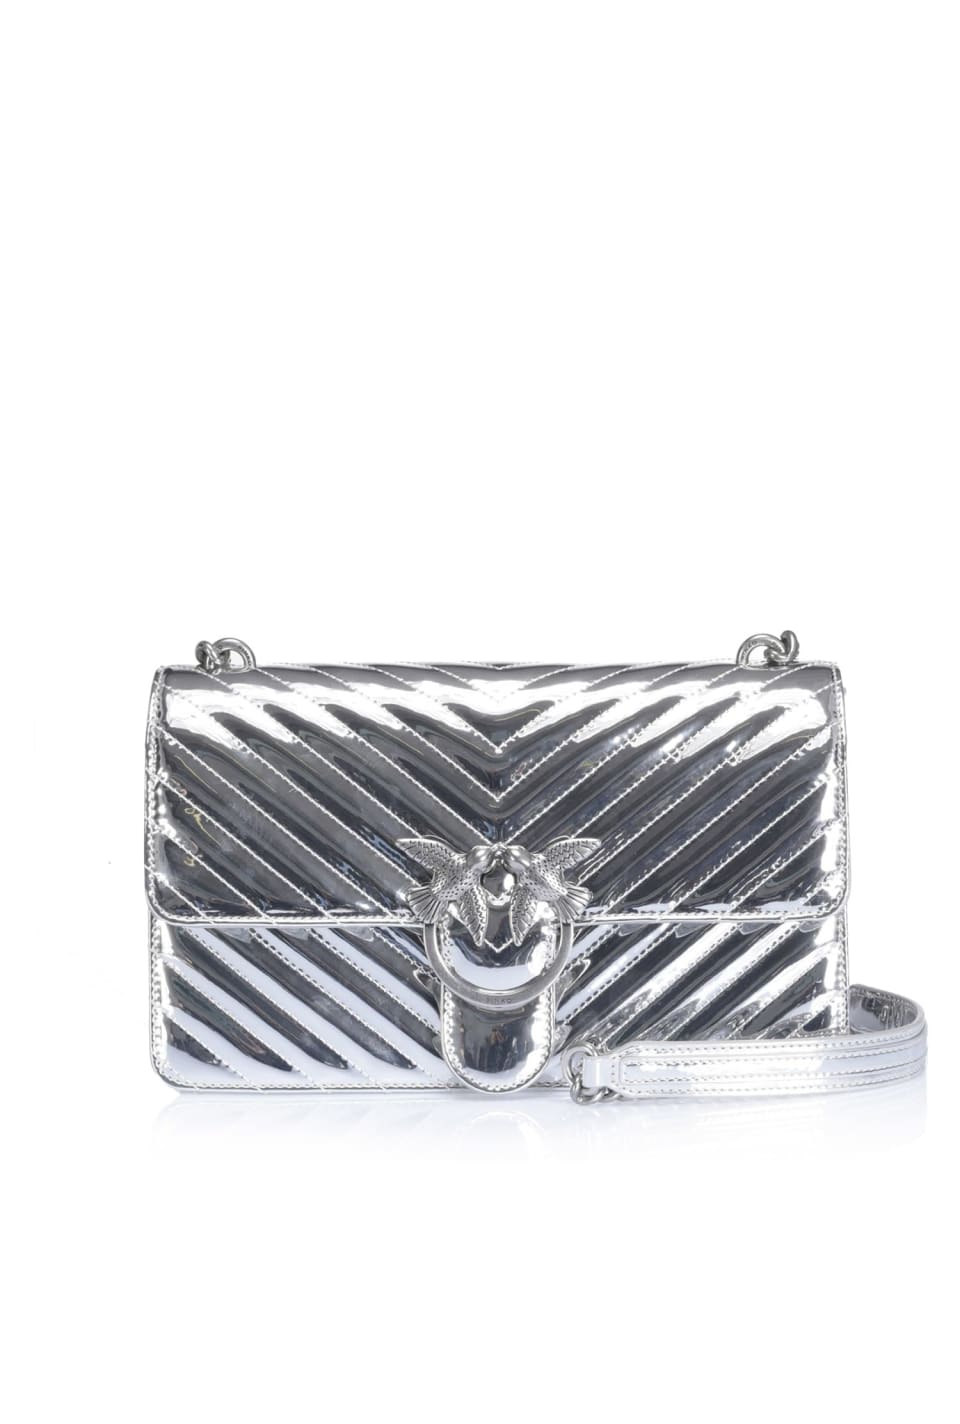 Mirror-finish Quilting Love Bag